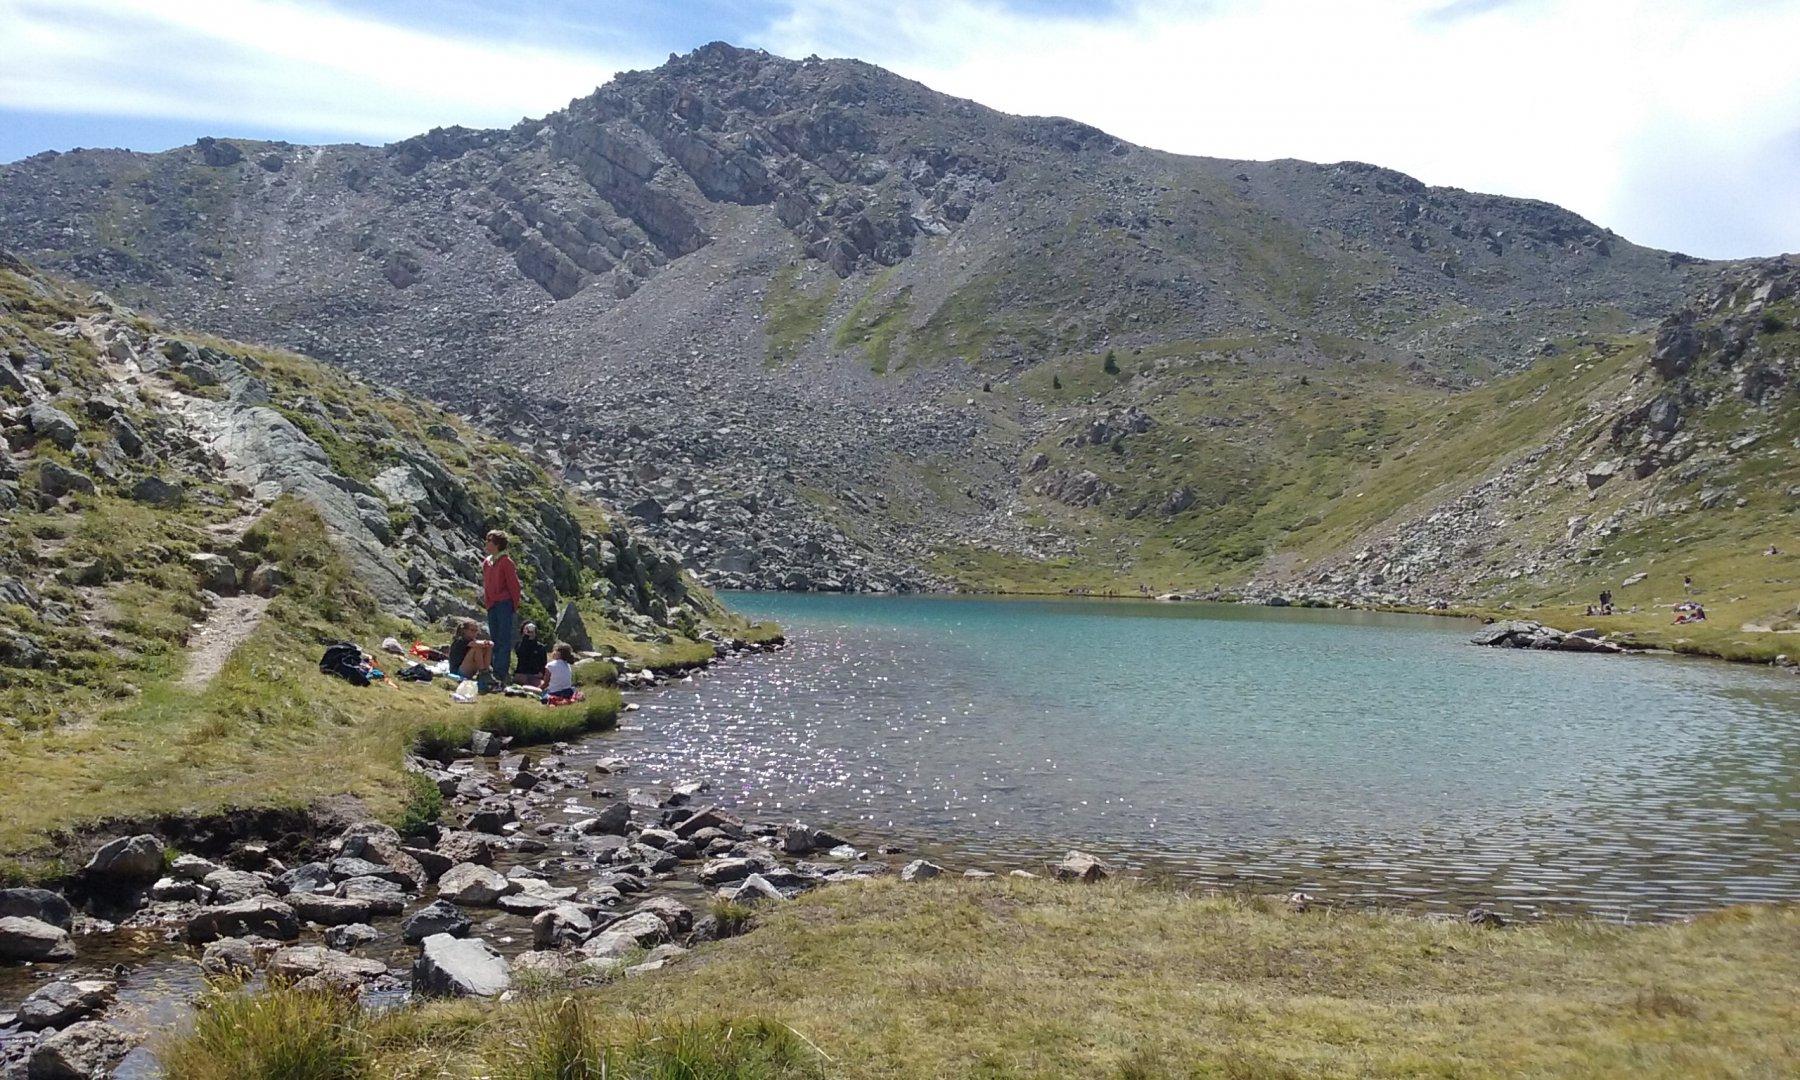 Cristol, Cibières, Oule (Col de) da Nevache, anello 2016-08-19